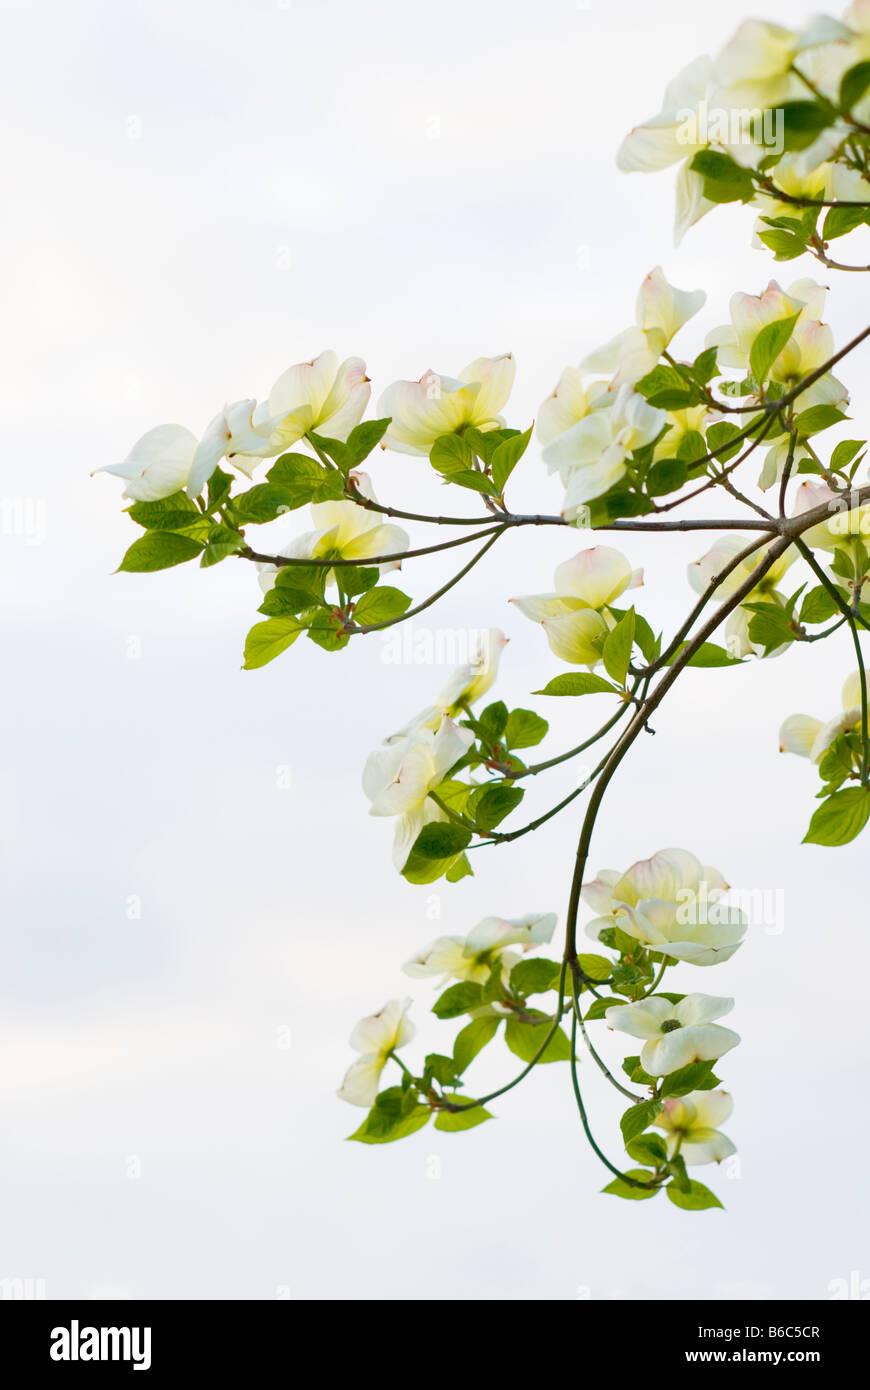 flowering season stockfotos flowering season bilder alamy. Black Bedroom Furniture Sets. Home Design Ideas